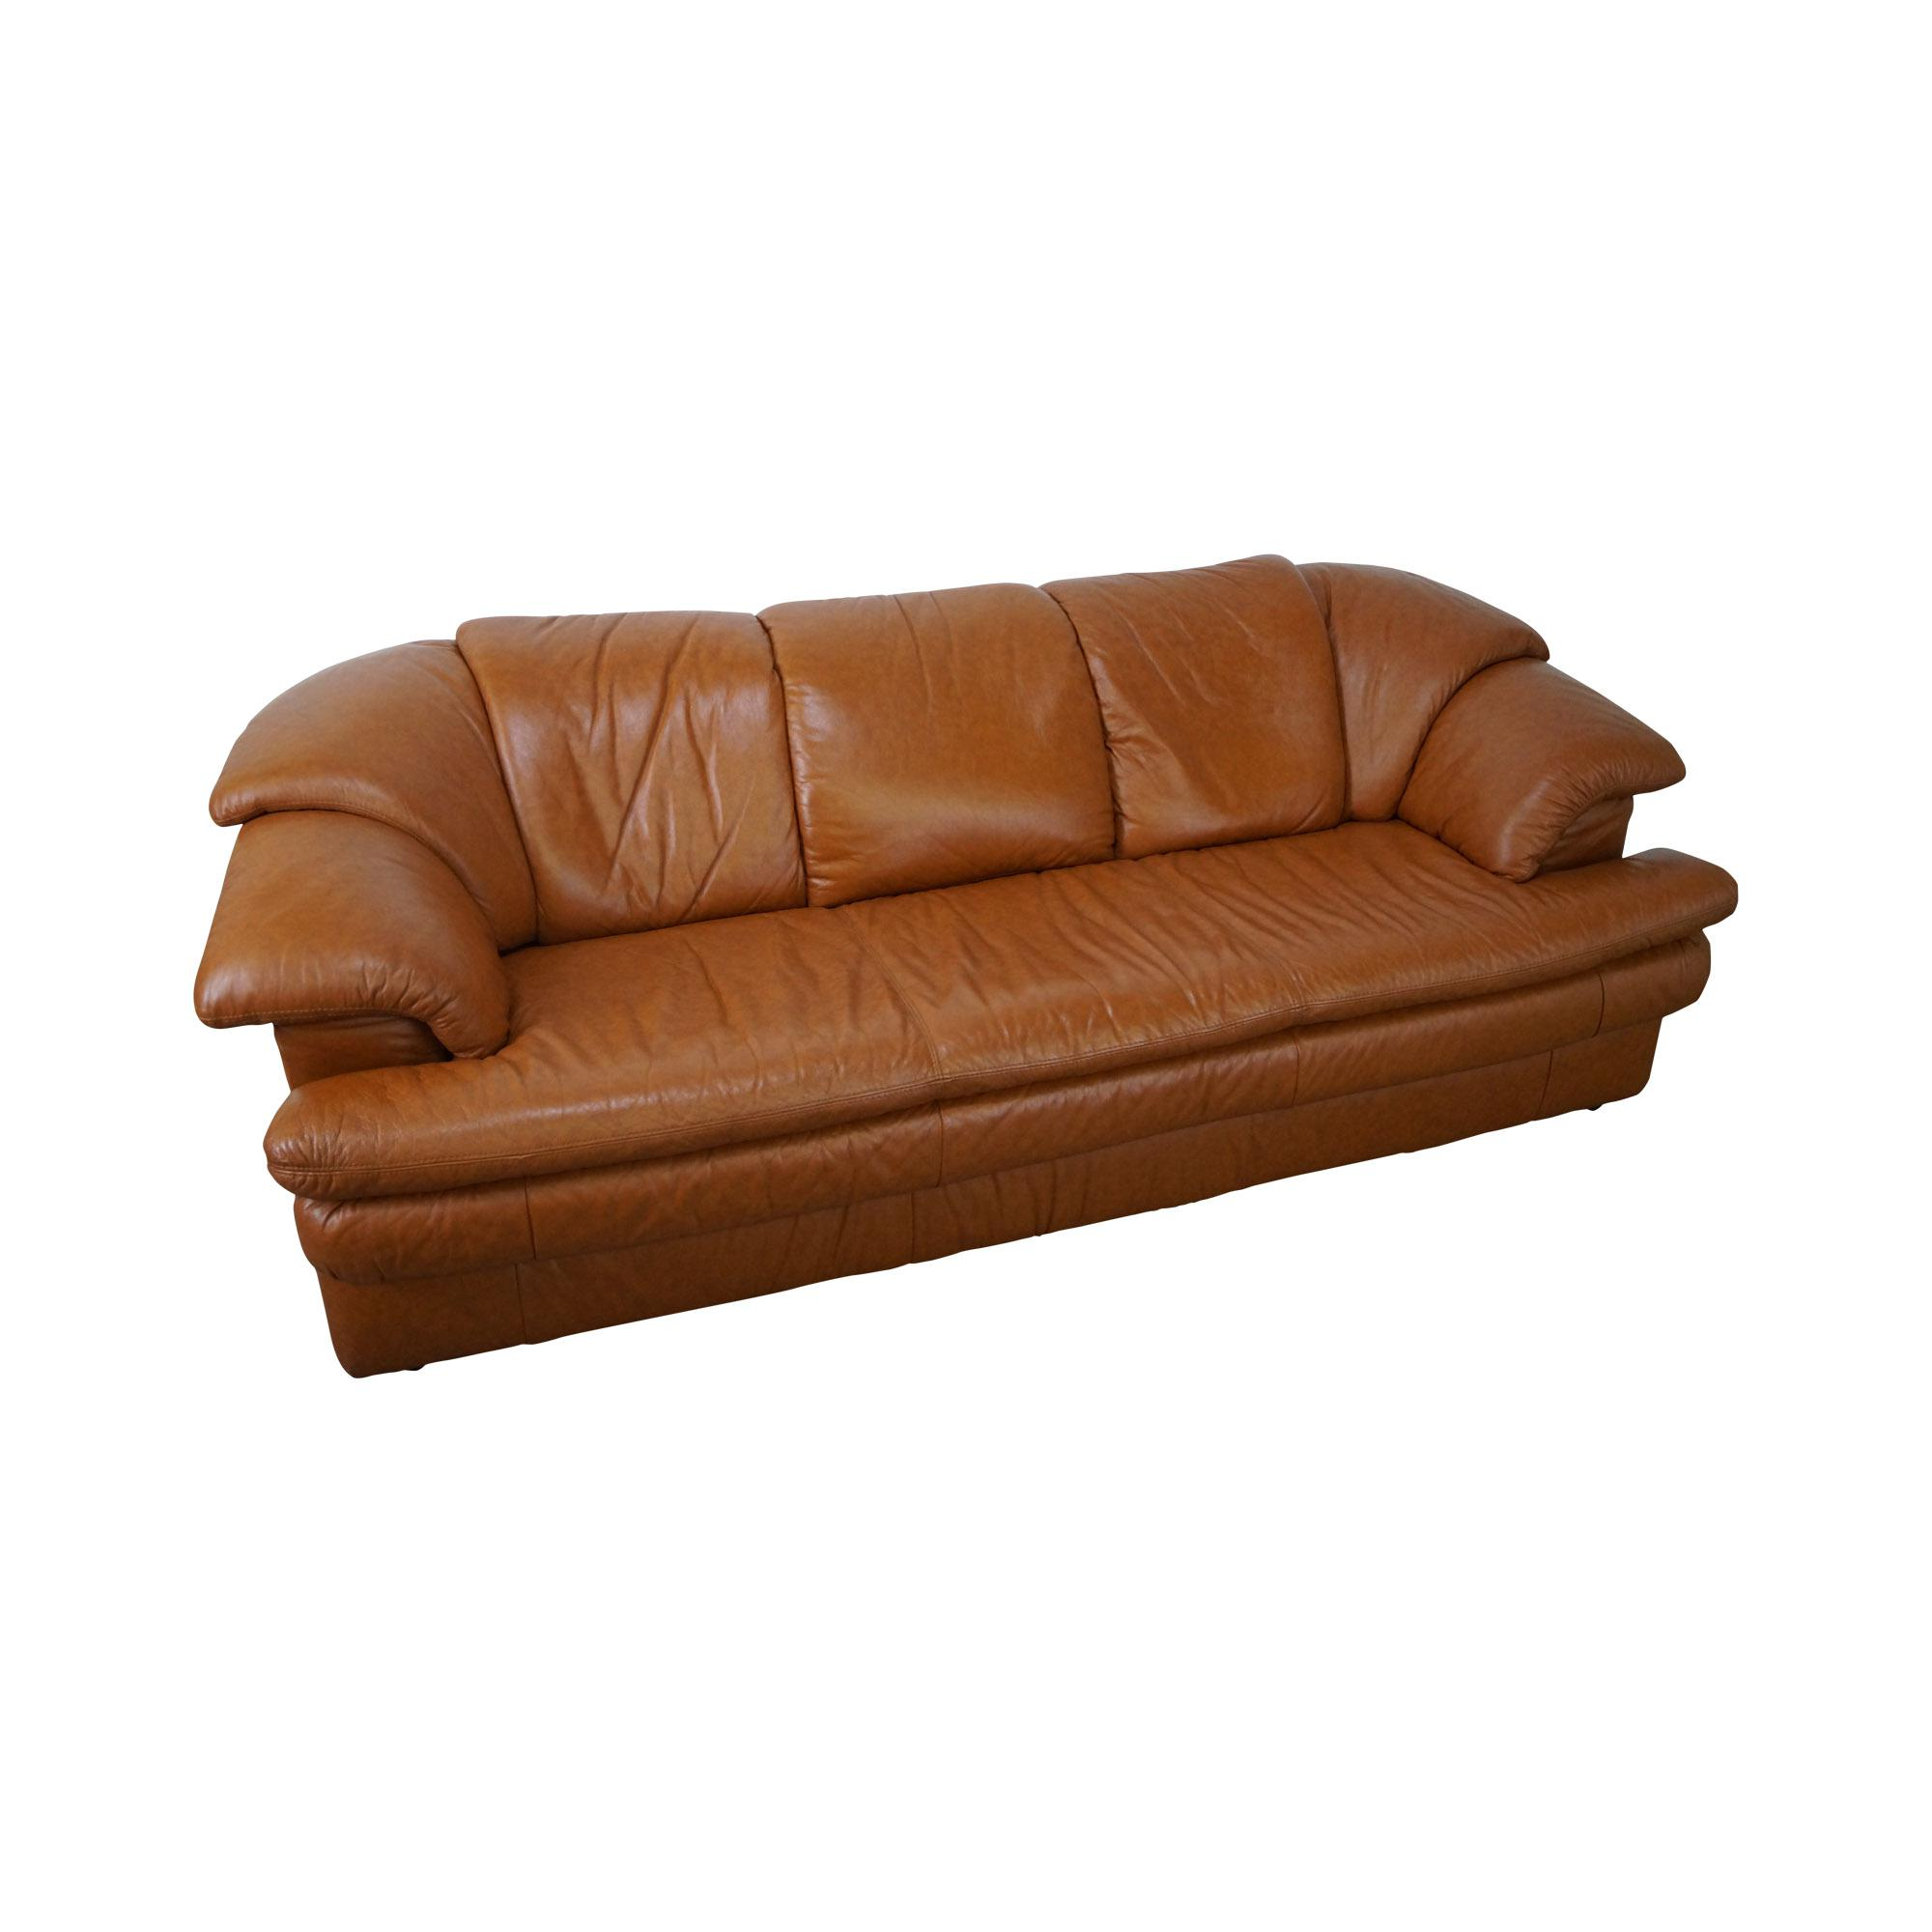 caramel colored leather sofas sofa suppliers malaysia natuzzi vintage color chairish